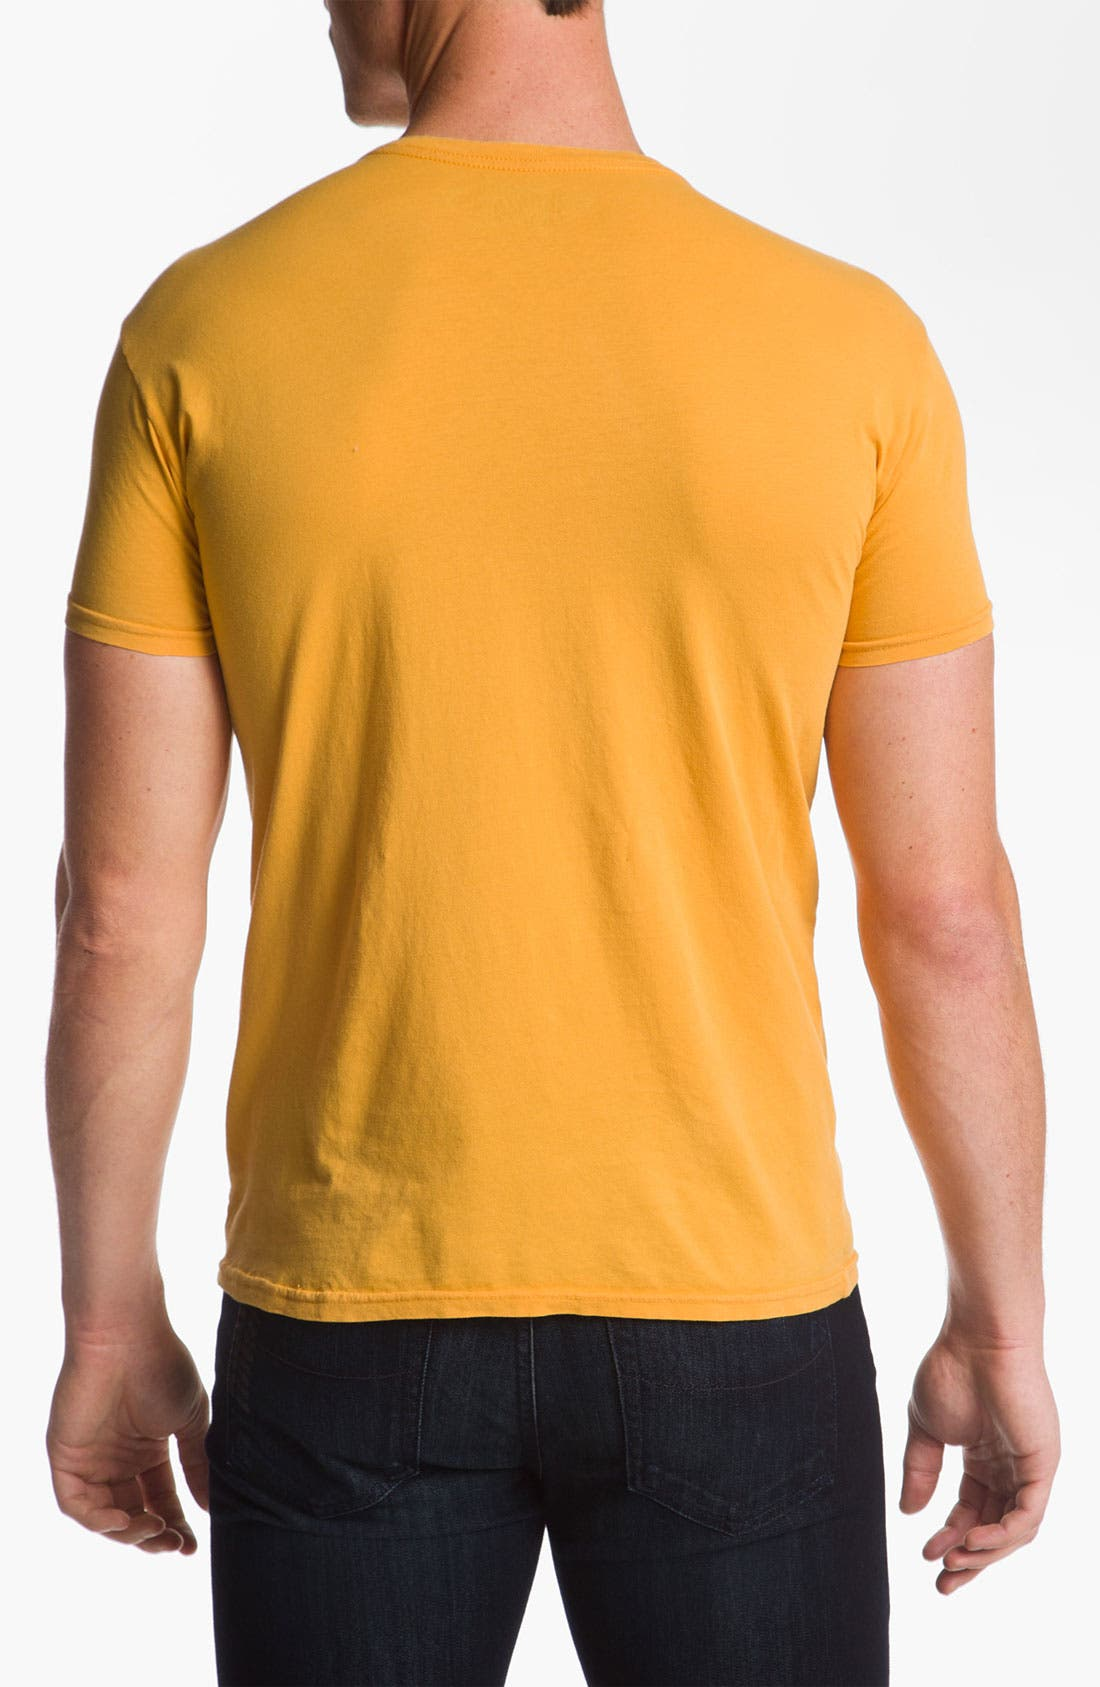 Alternate Image 2  - The Original Retro Brand 'Louisiana State Tigers' T-Shirt